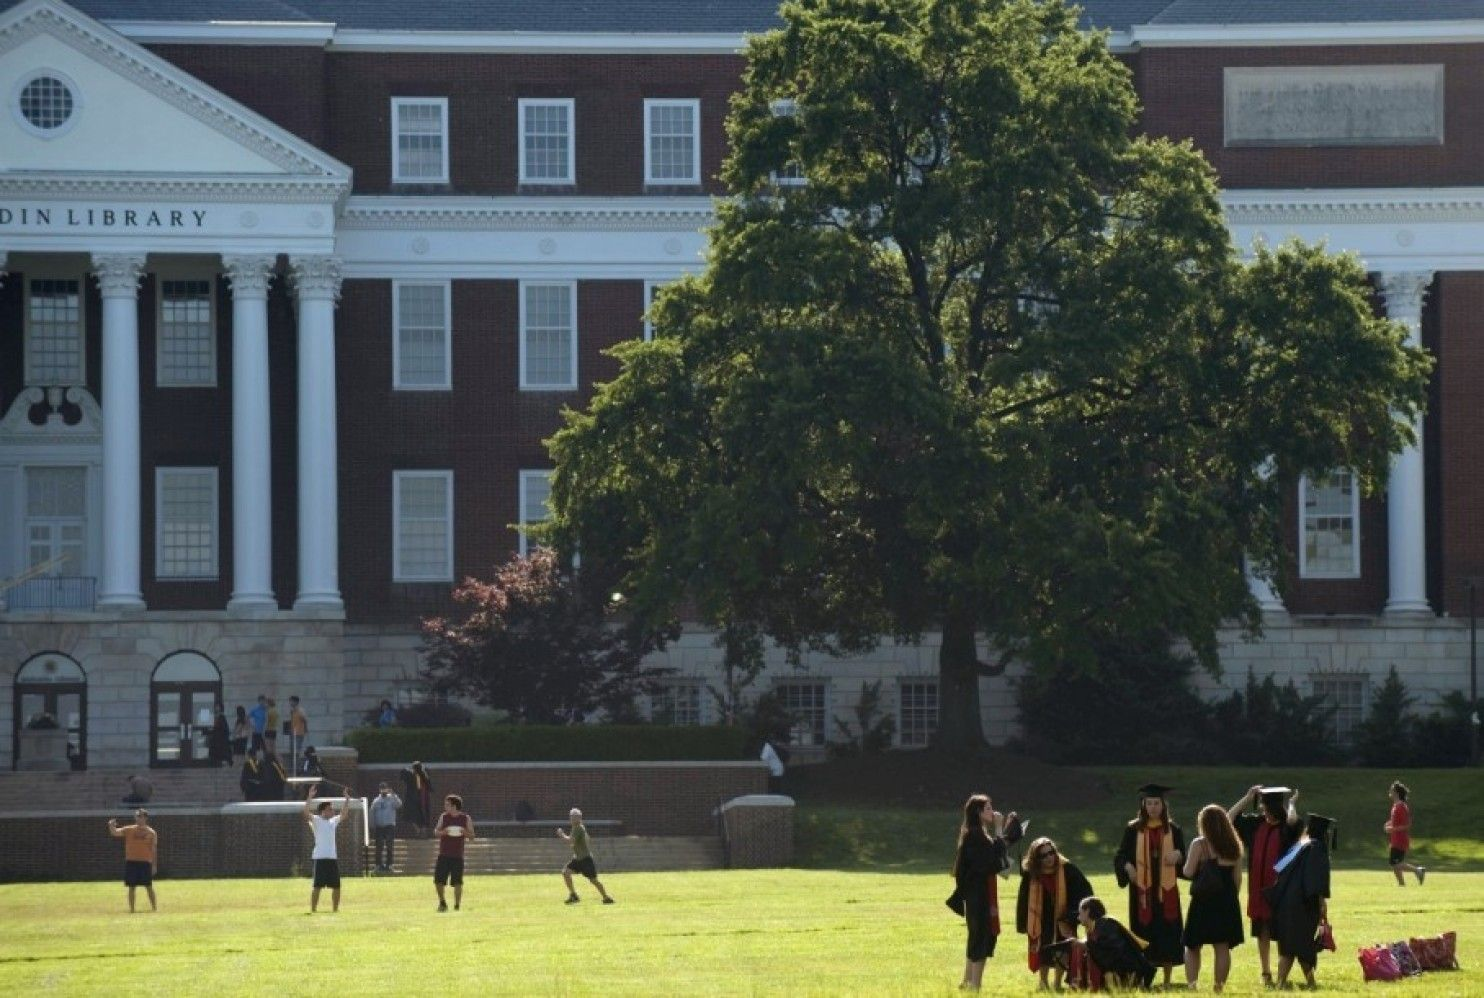 Prestige Schools Team Up On Redesigned College Application College Application Online Education University Of Maryland